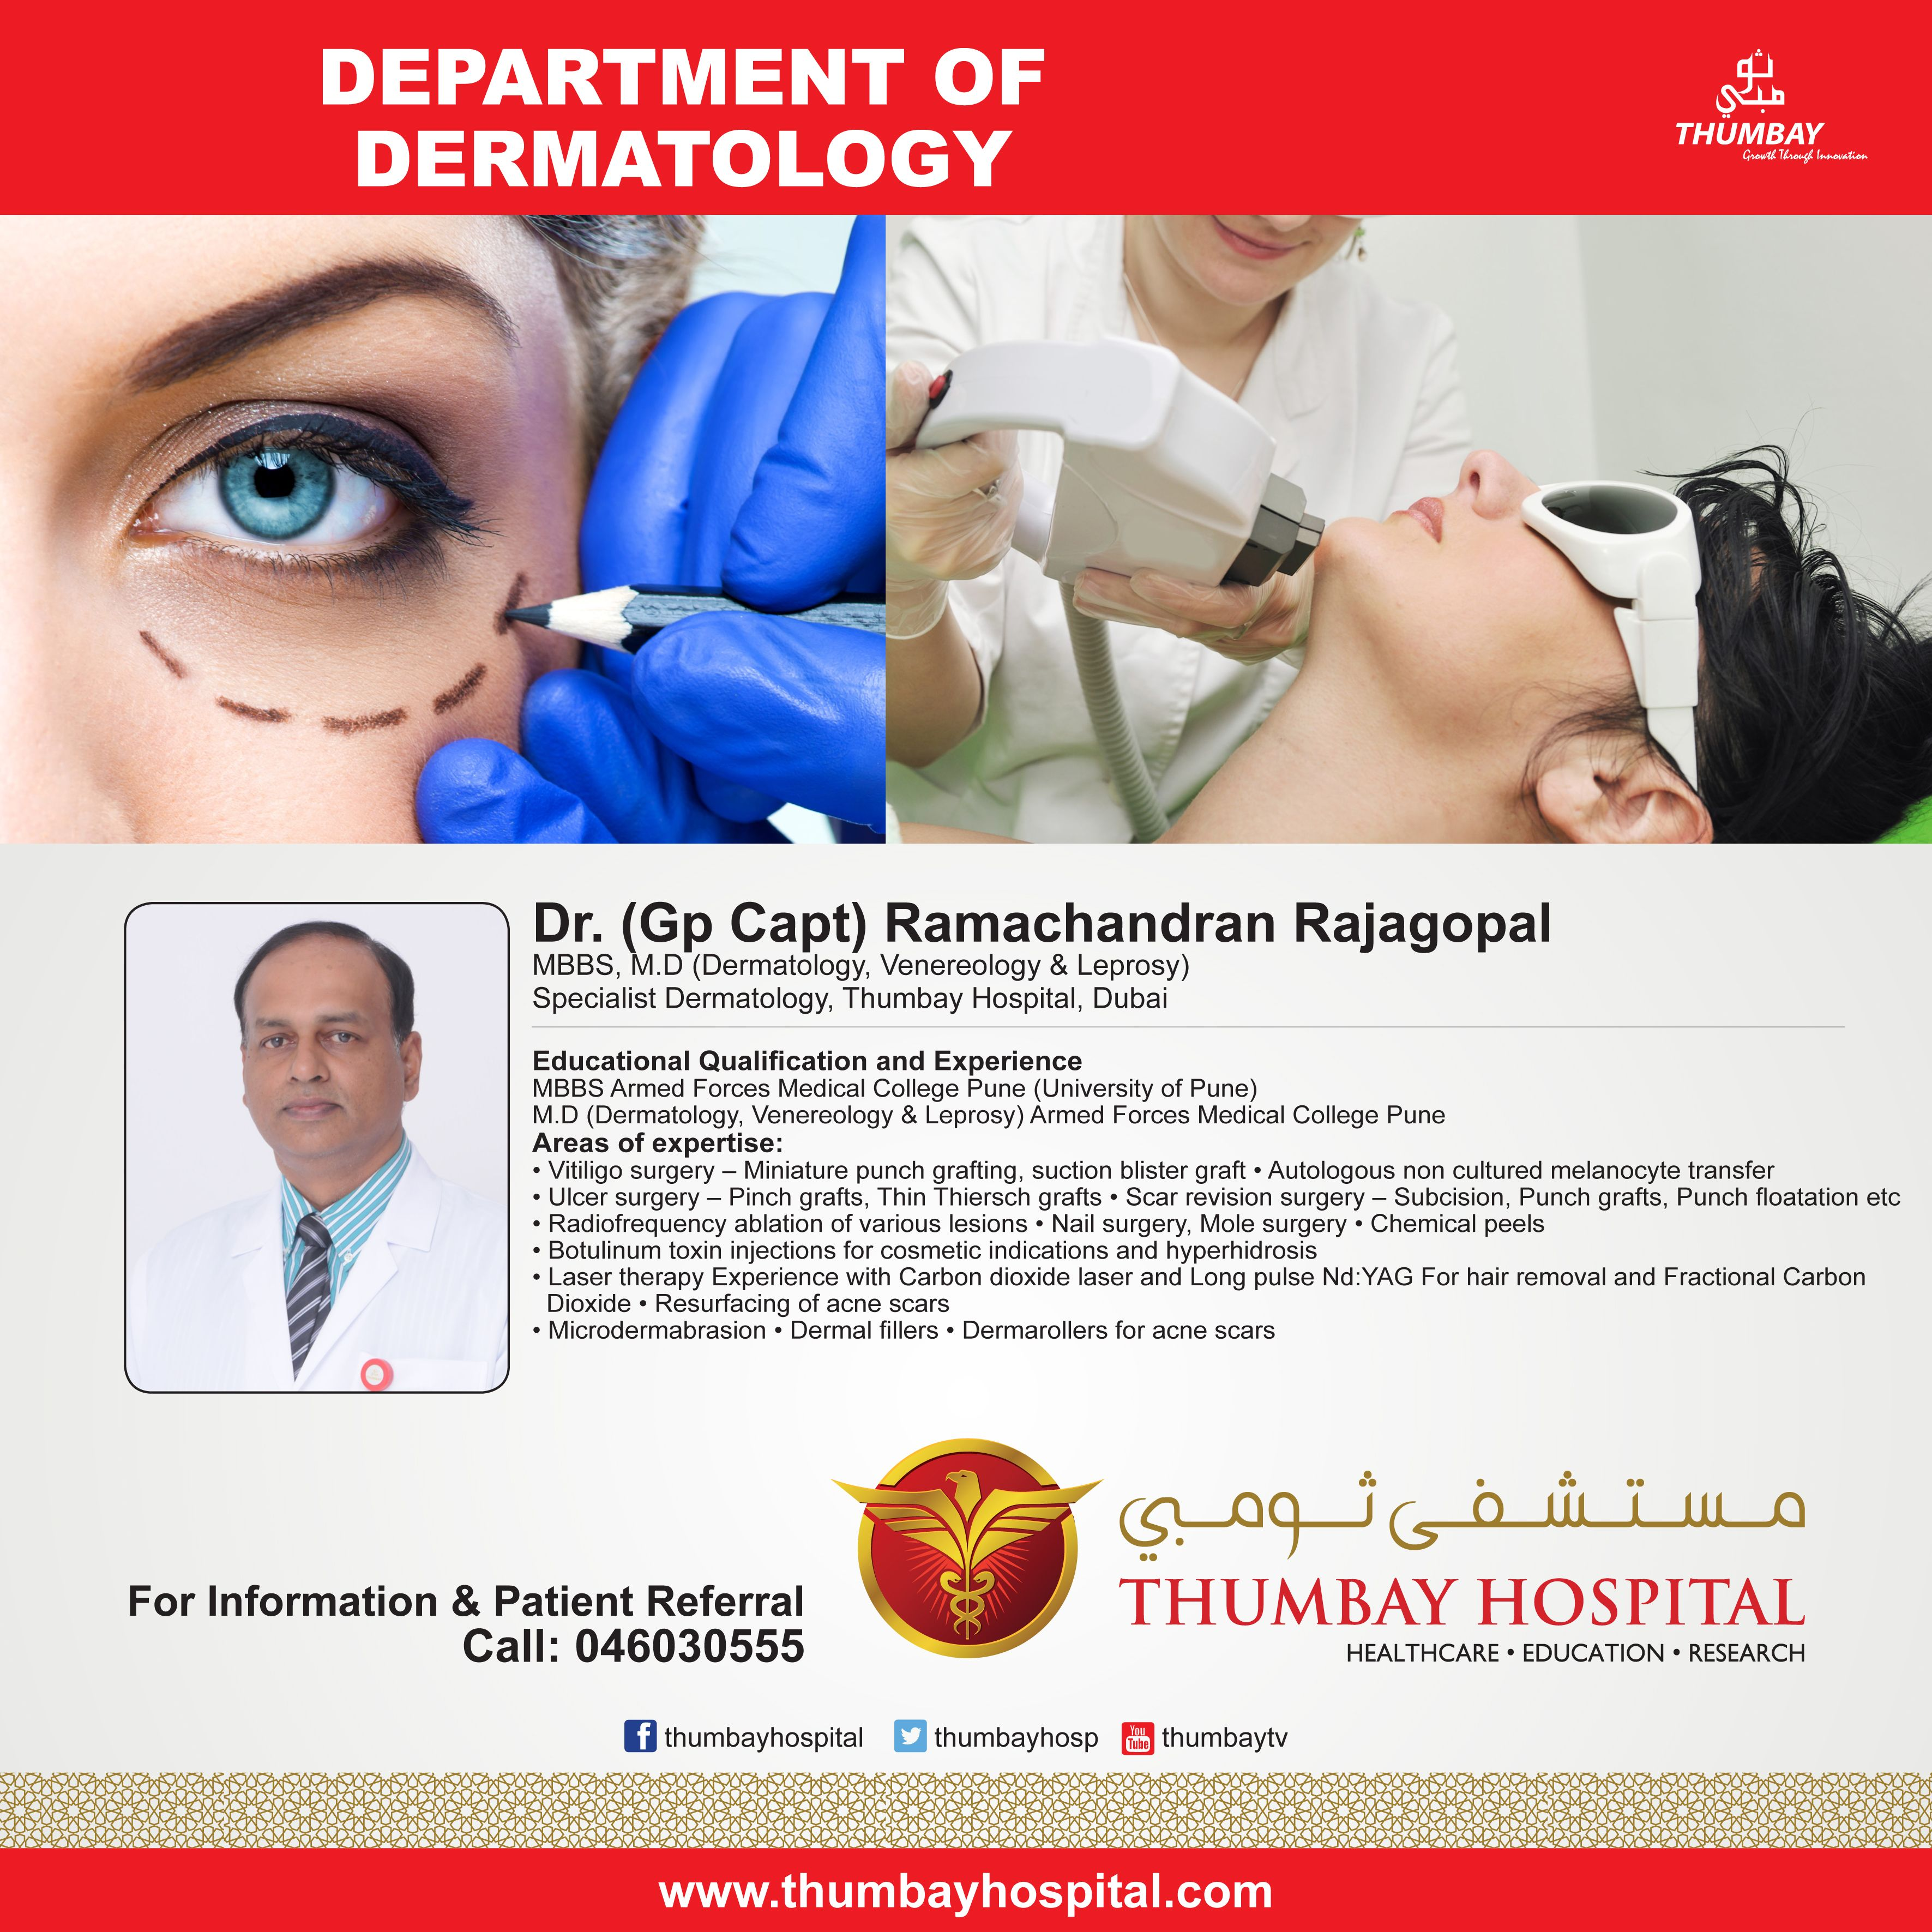 Meet Dr Gp Capt Ramachandran Rajagopal Mbbs M D Dermatology